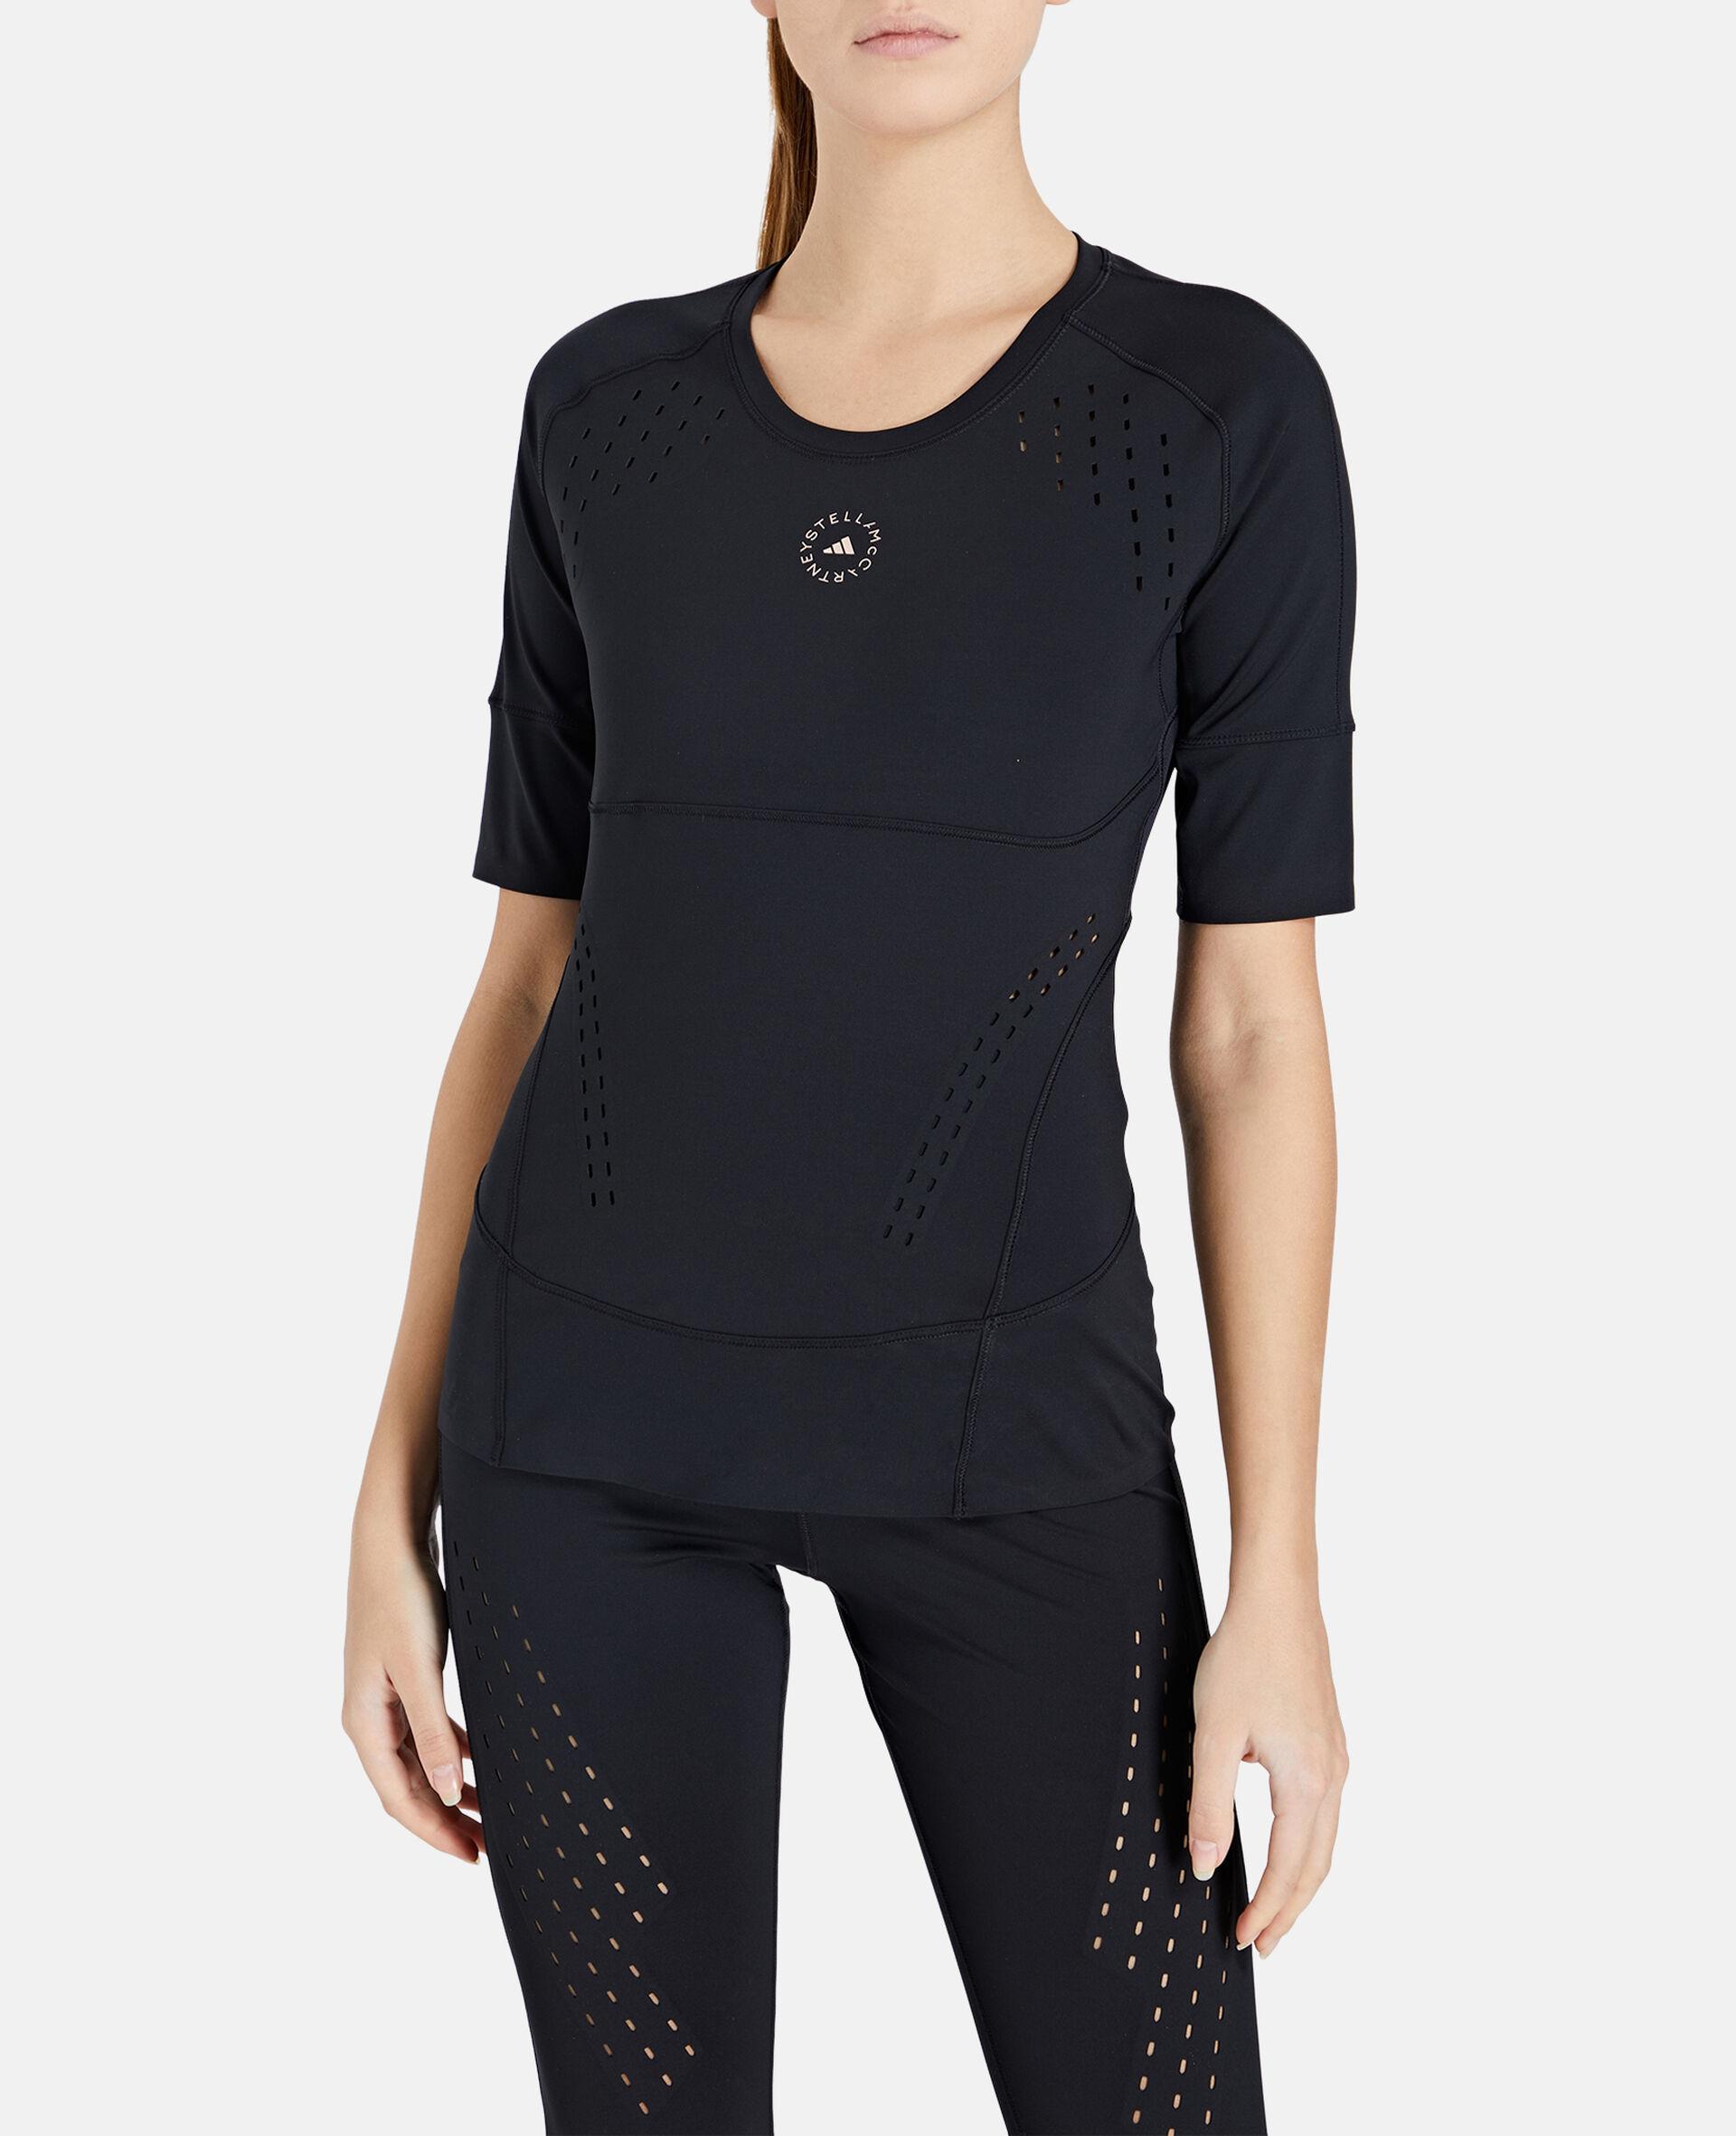 Black TruePurpose Training T-Shirt-Black-large image number 4